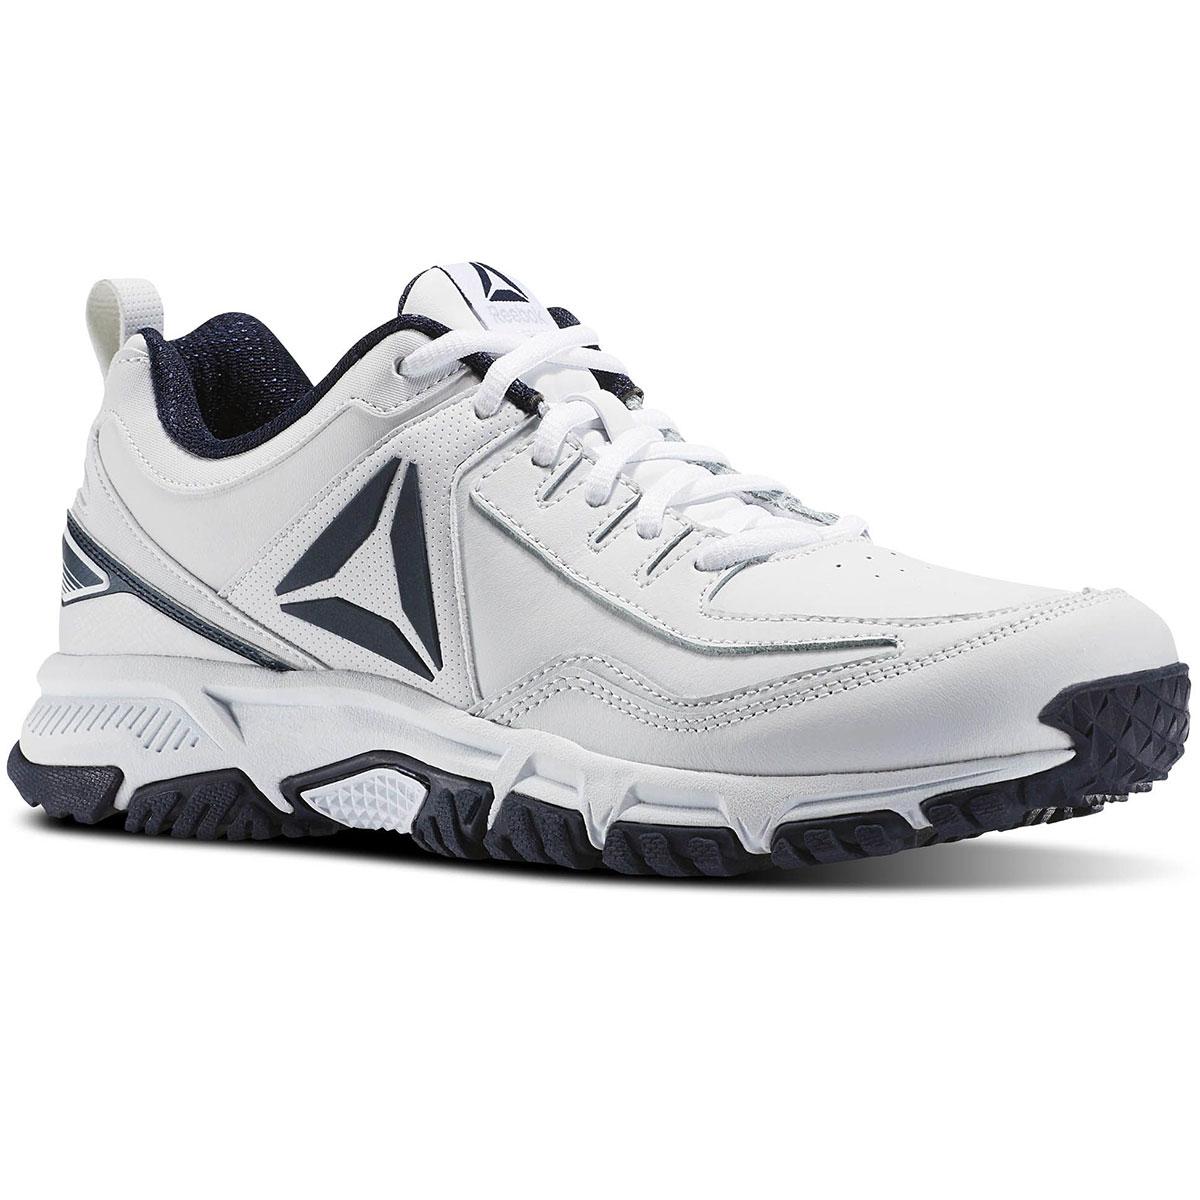 KohlsCardholders:Reebok Ridgerider Men's Leather Training Shoes - $16.79. Black-7, 10.5, 13, 8 4E,13 4E, 14 4E  or White w/Navy-7.5, 8, 8.5, 10.5, 11, 13 & 13 4E